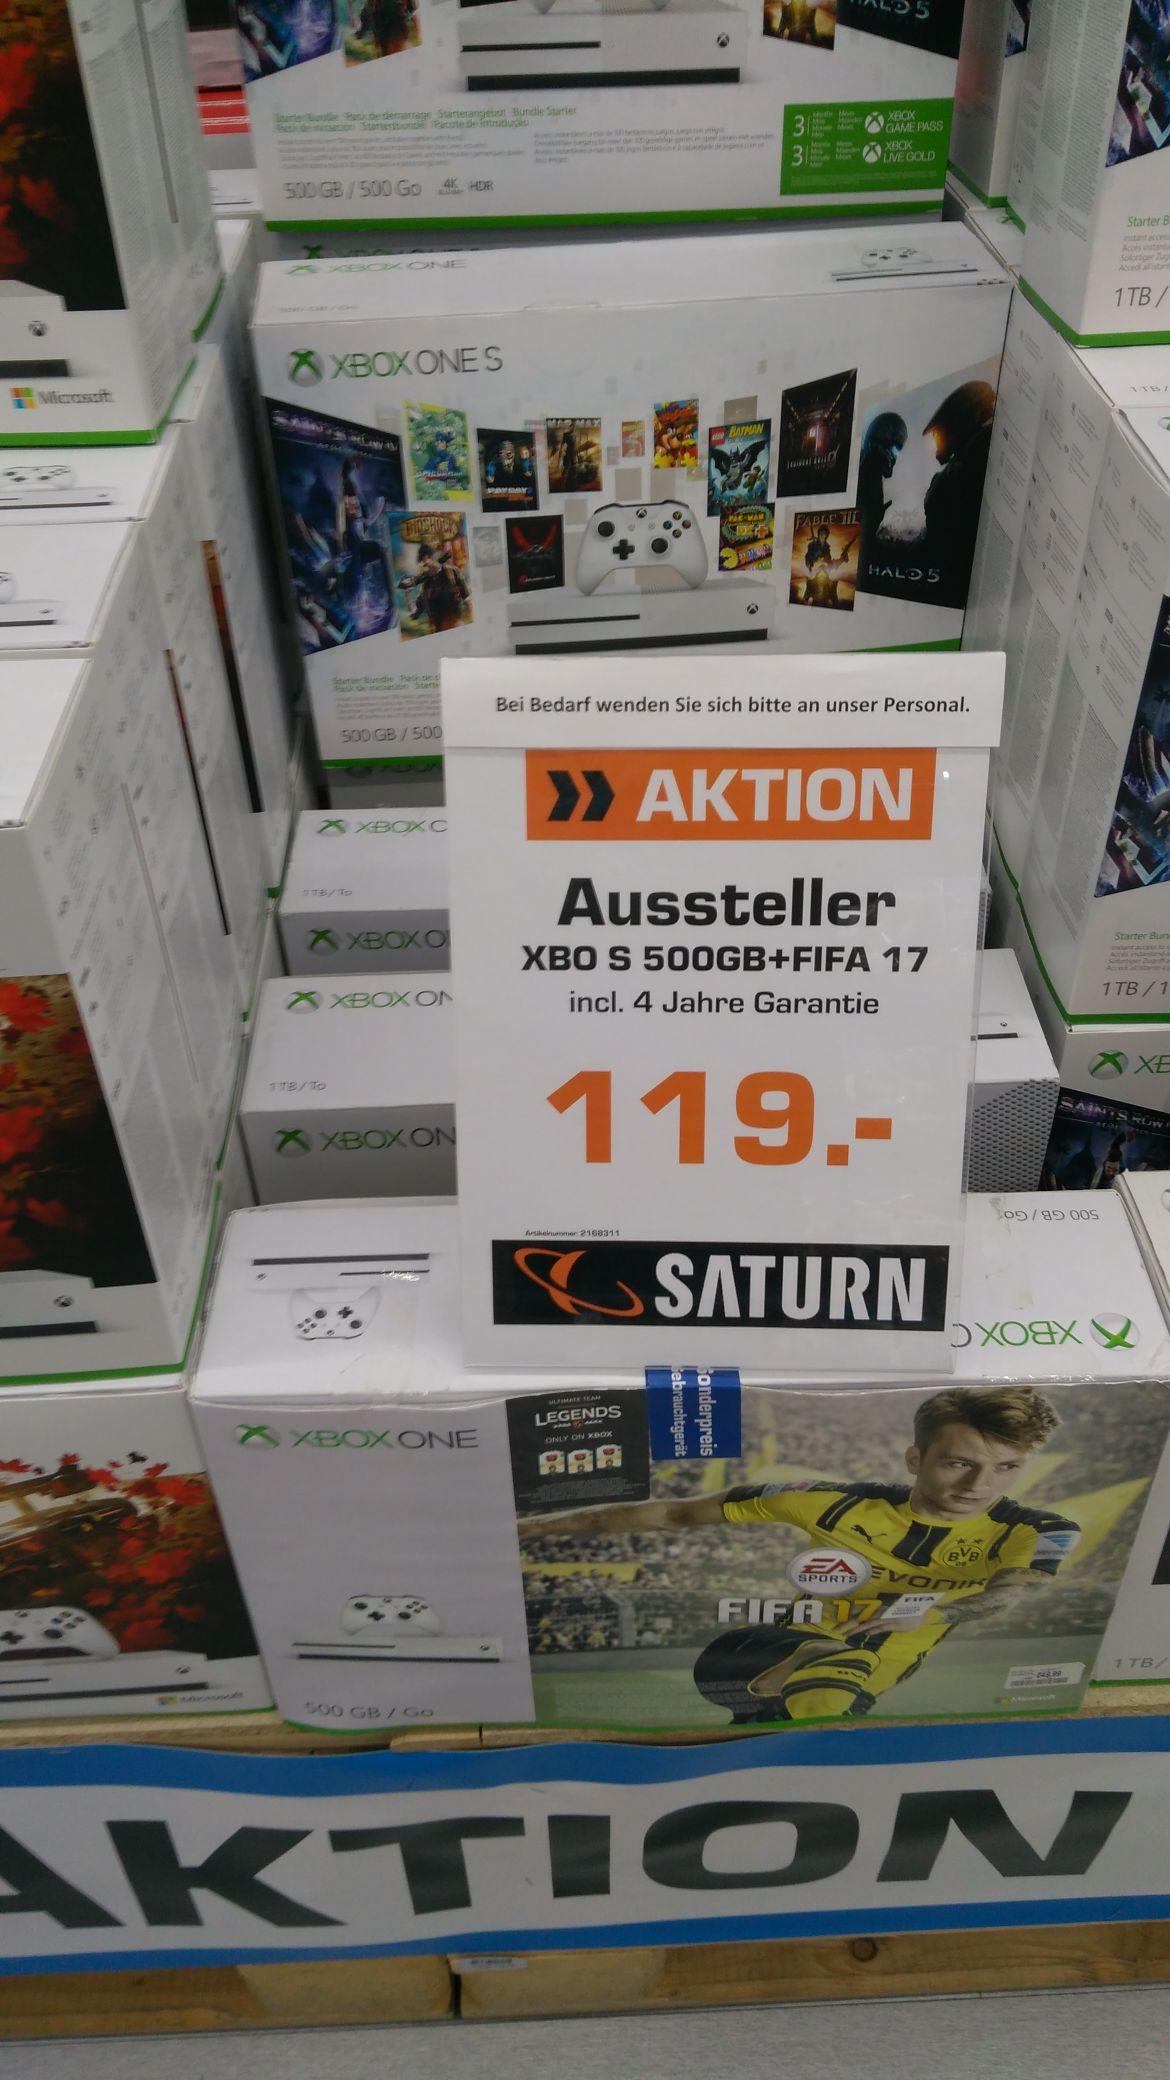 Lokal Ingolstadt Saturn xBox one S 500gb + Fifa 17 inkl.4Jahre Garantie